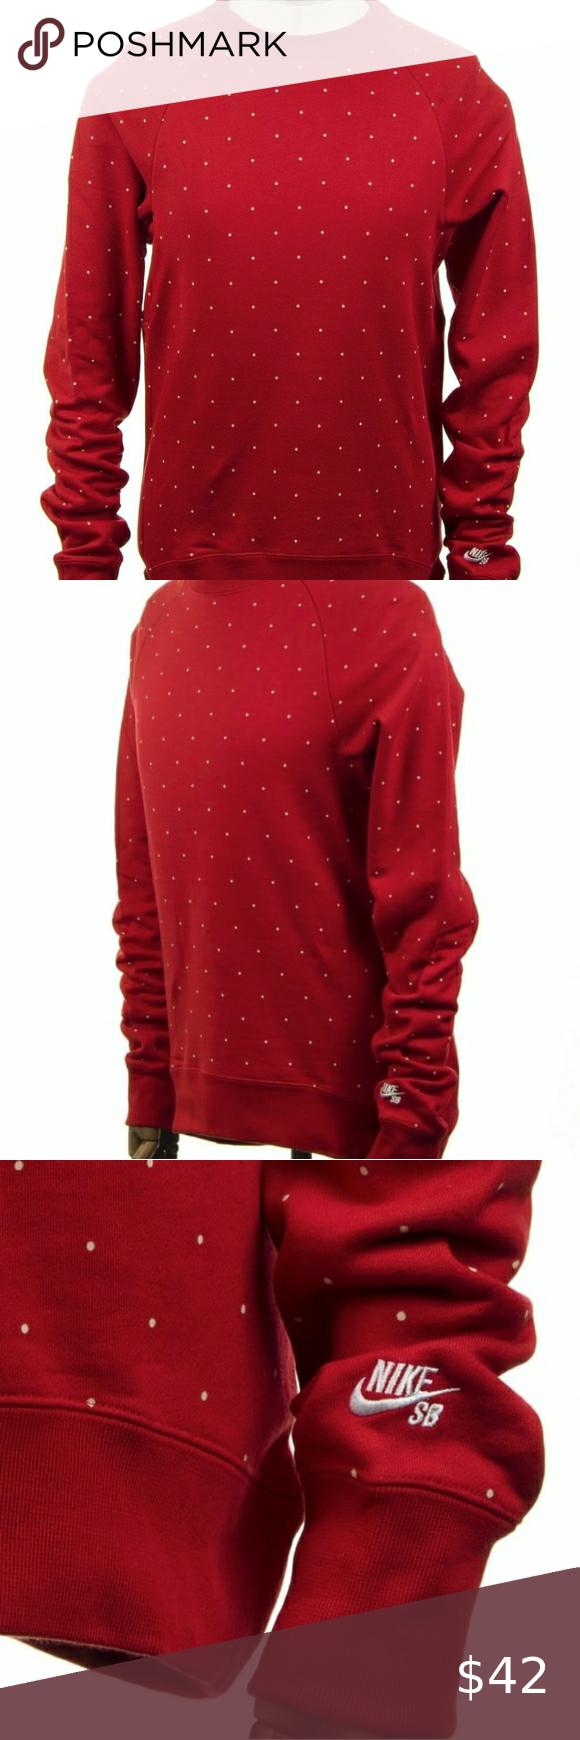 Predownload: Nike Sb Everett Polka Dot Sweatshirt Red White In 2020 Nike Sb Red Leather Jacket Polka Dots [ 1740 x 580 Pixel ]